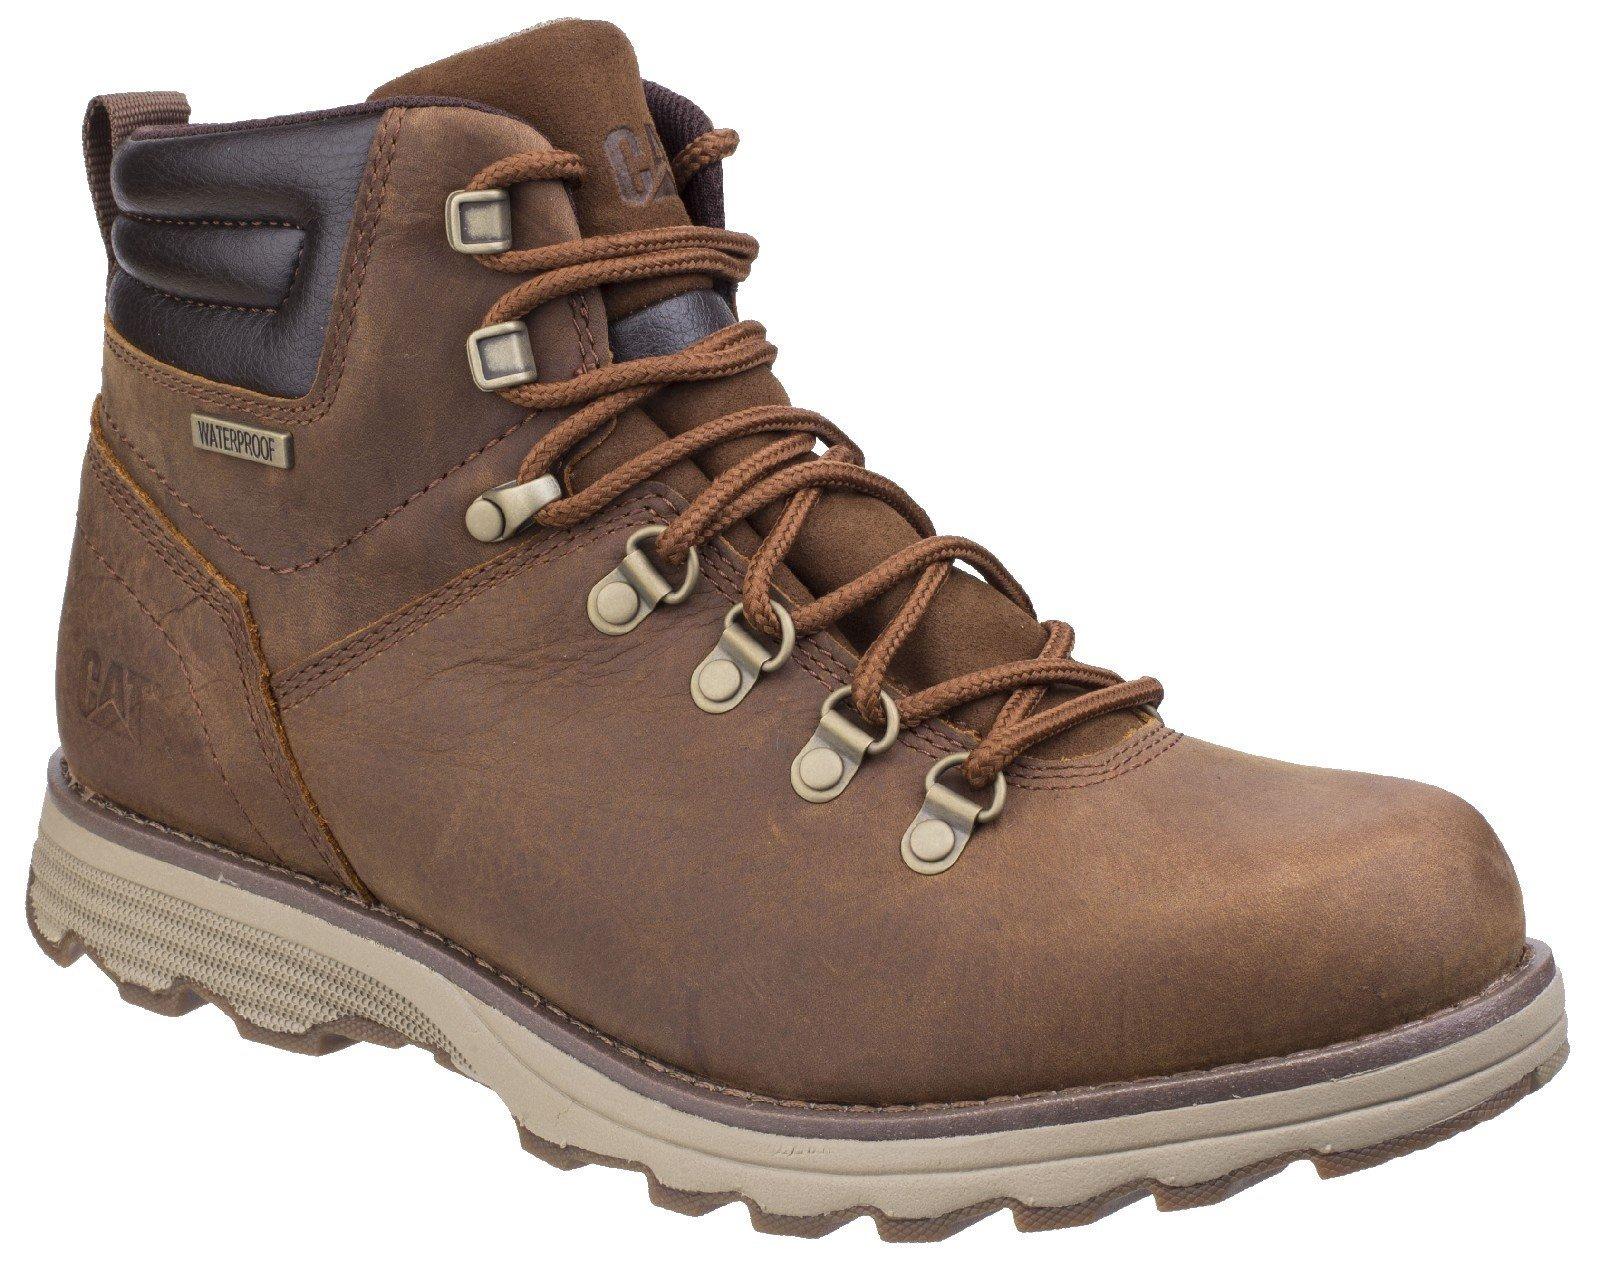 CAT Lifestyle Men's Sire Waterproof Lace Up Boot Brown Sugar 26181 - Brown Sugar 7